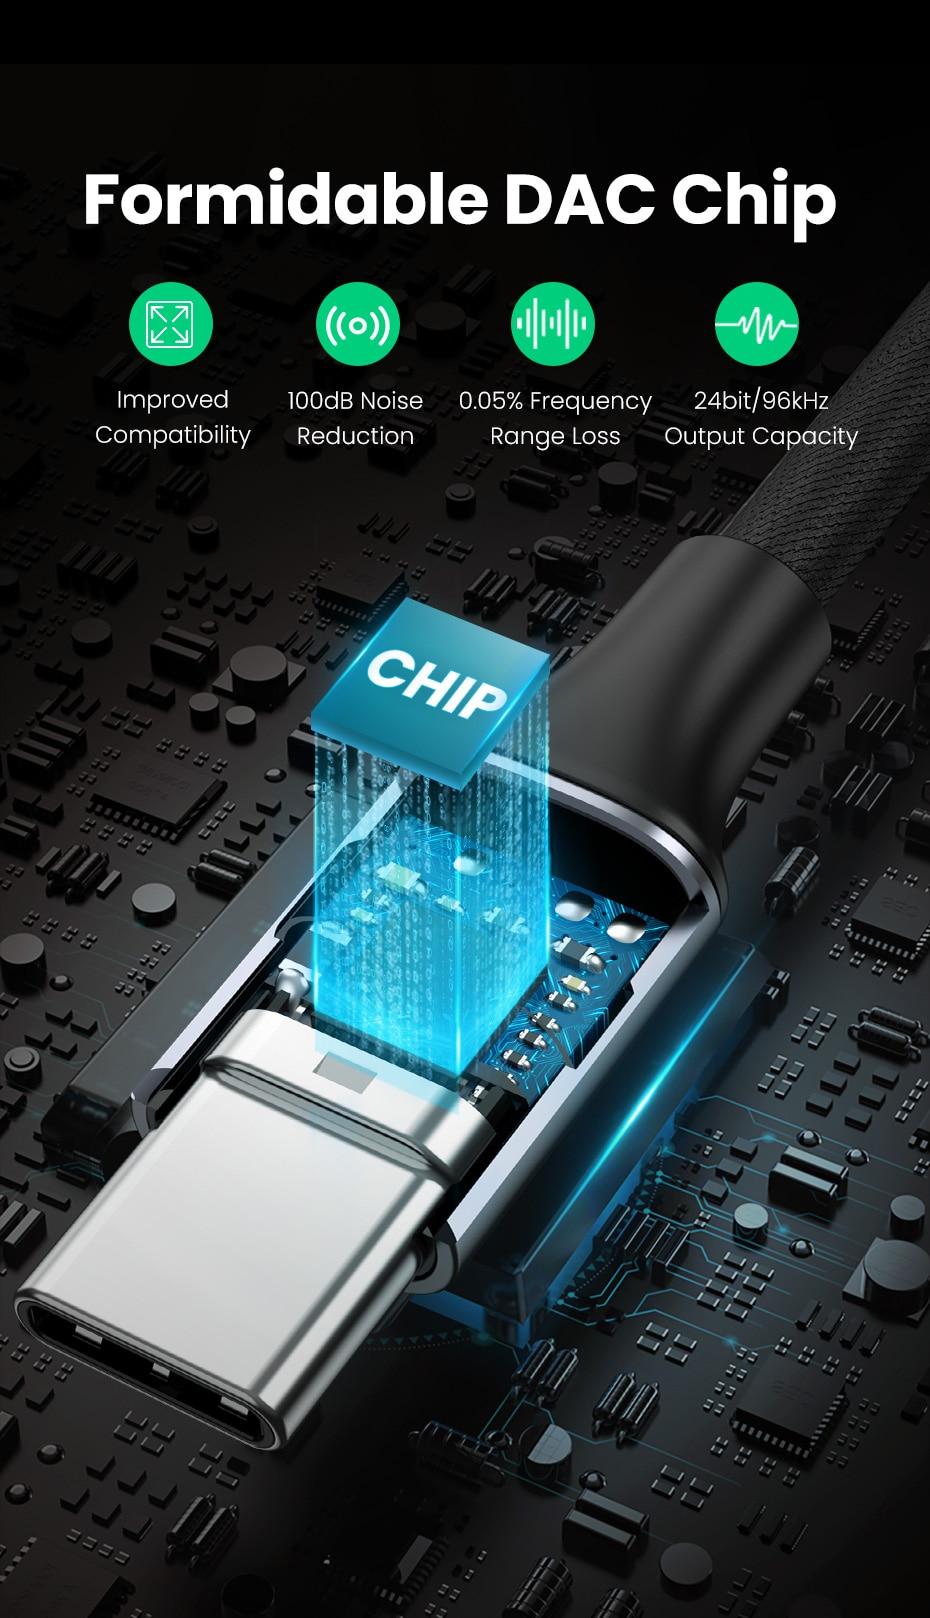 UGREEN Type C to 3.5mm Headphone Adapter DAC Pakistan BrandTech.pk